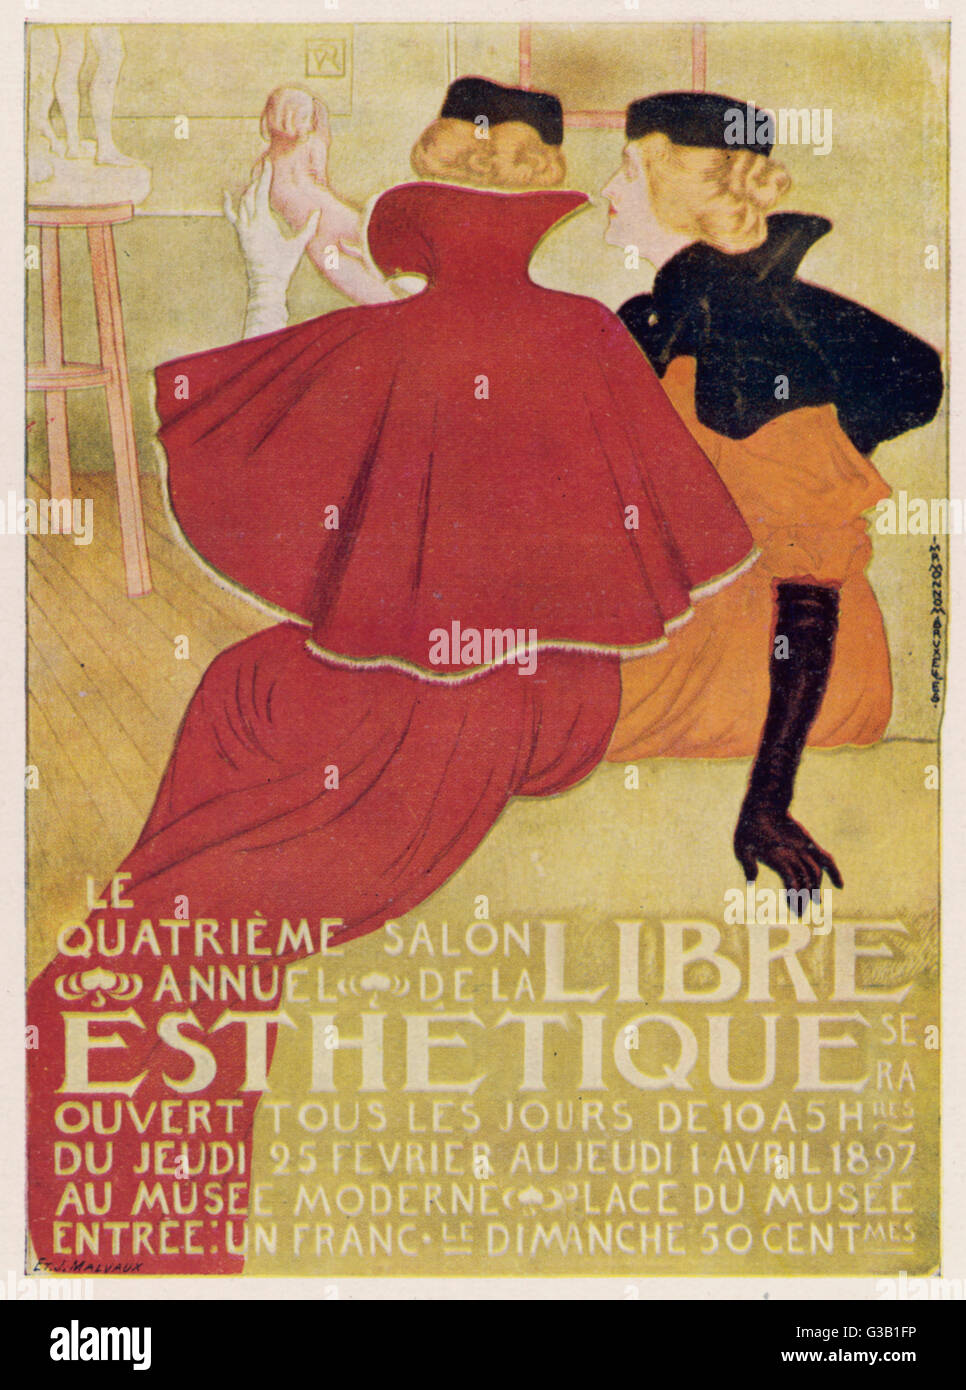 Poster for La Libre Esthetique, Brussels        Date: 1897 - Stock Image